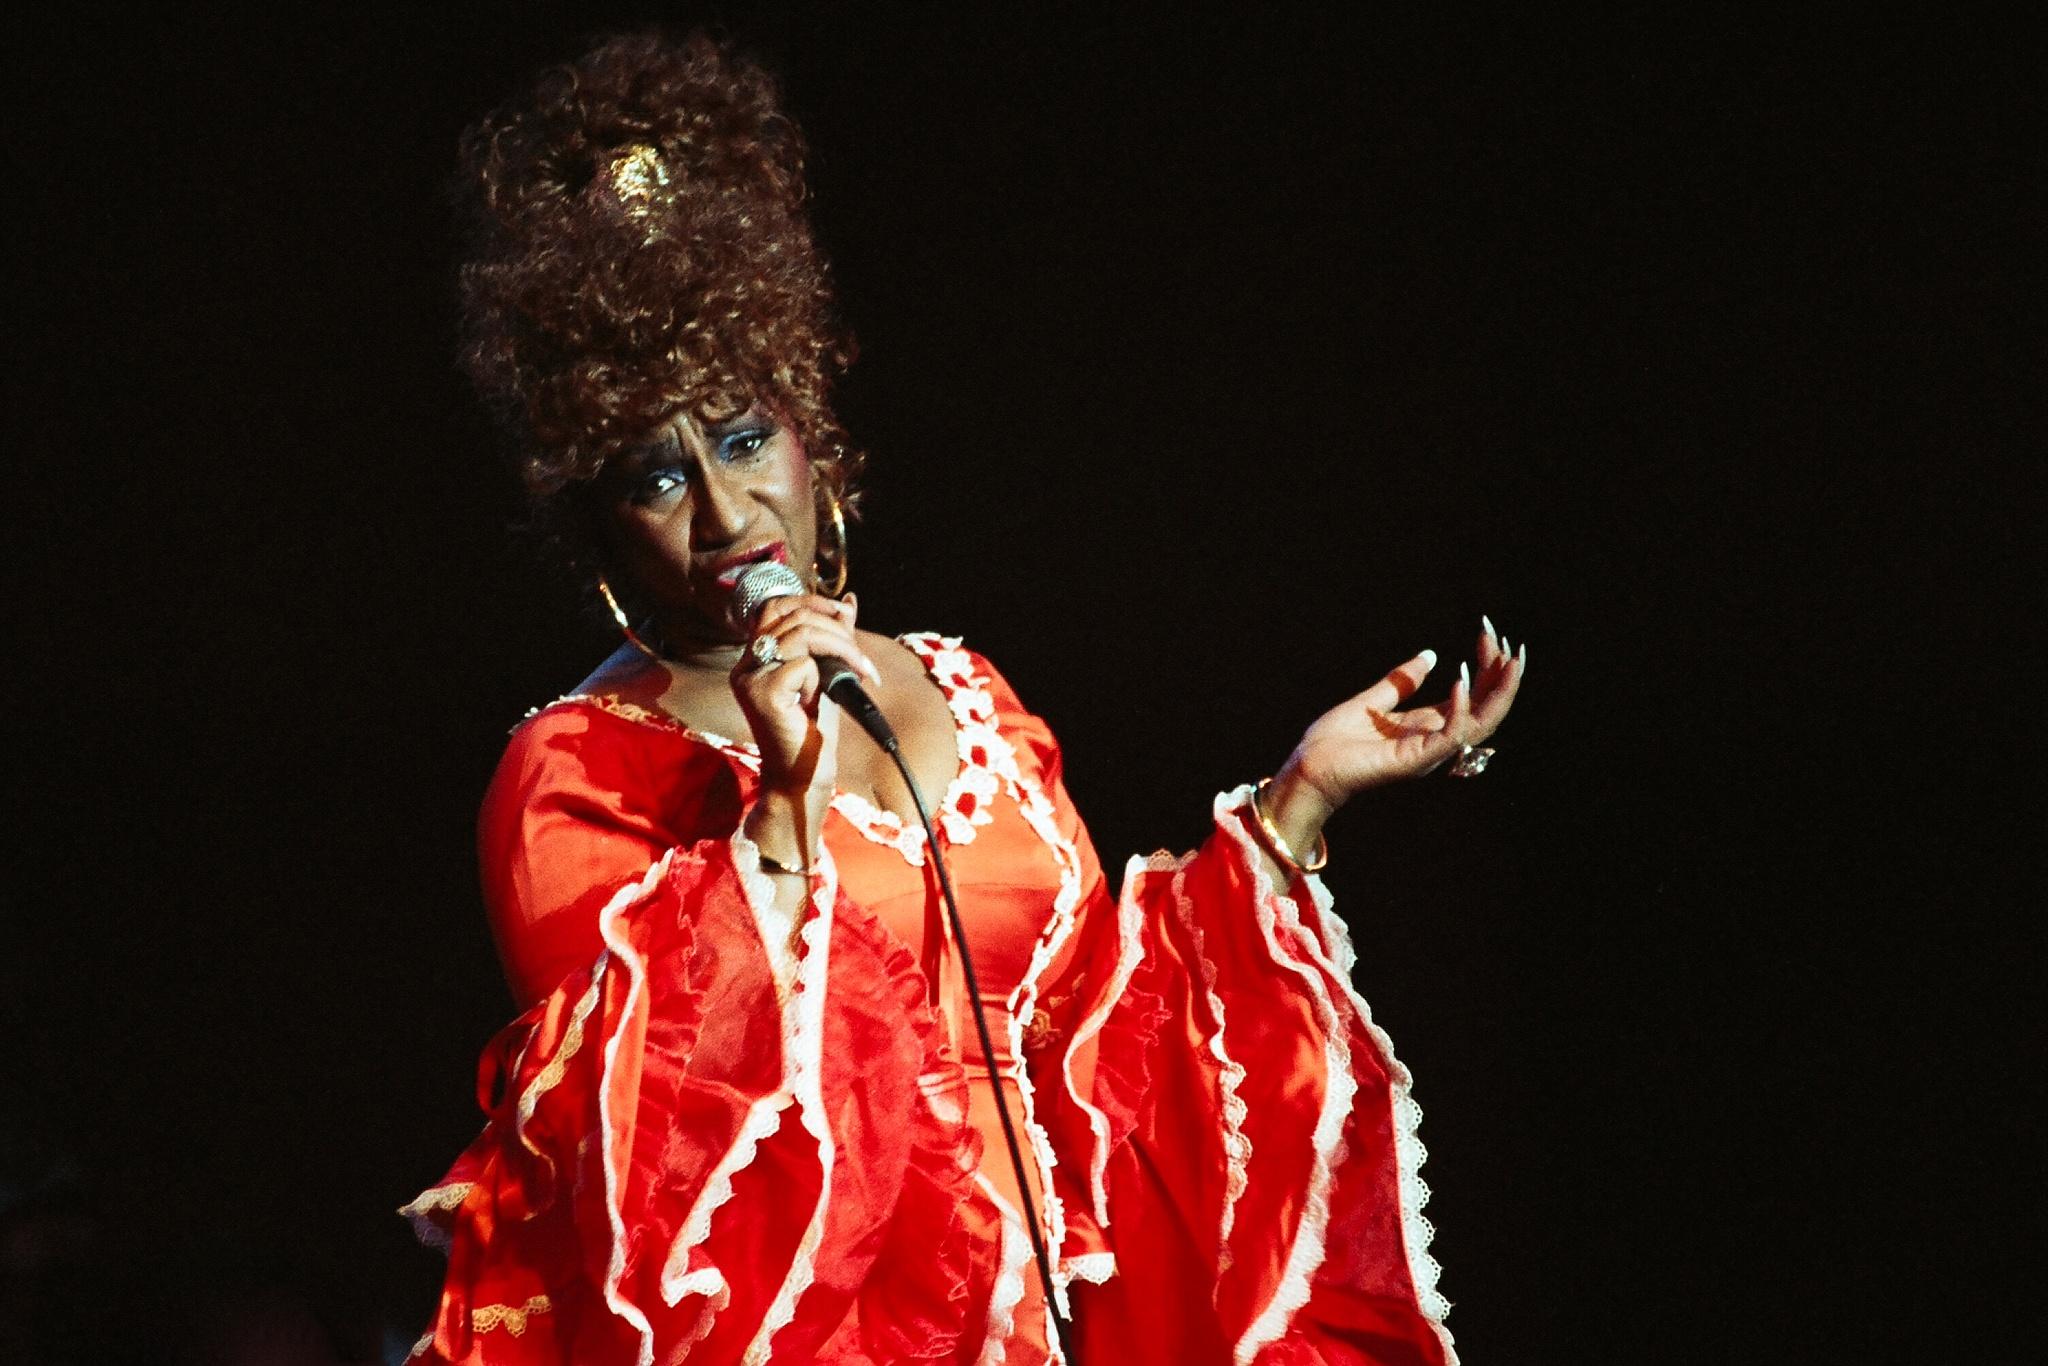 Ms Celia Cruz  1995  by Mario Muyet